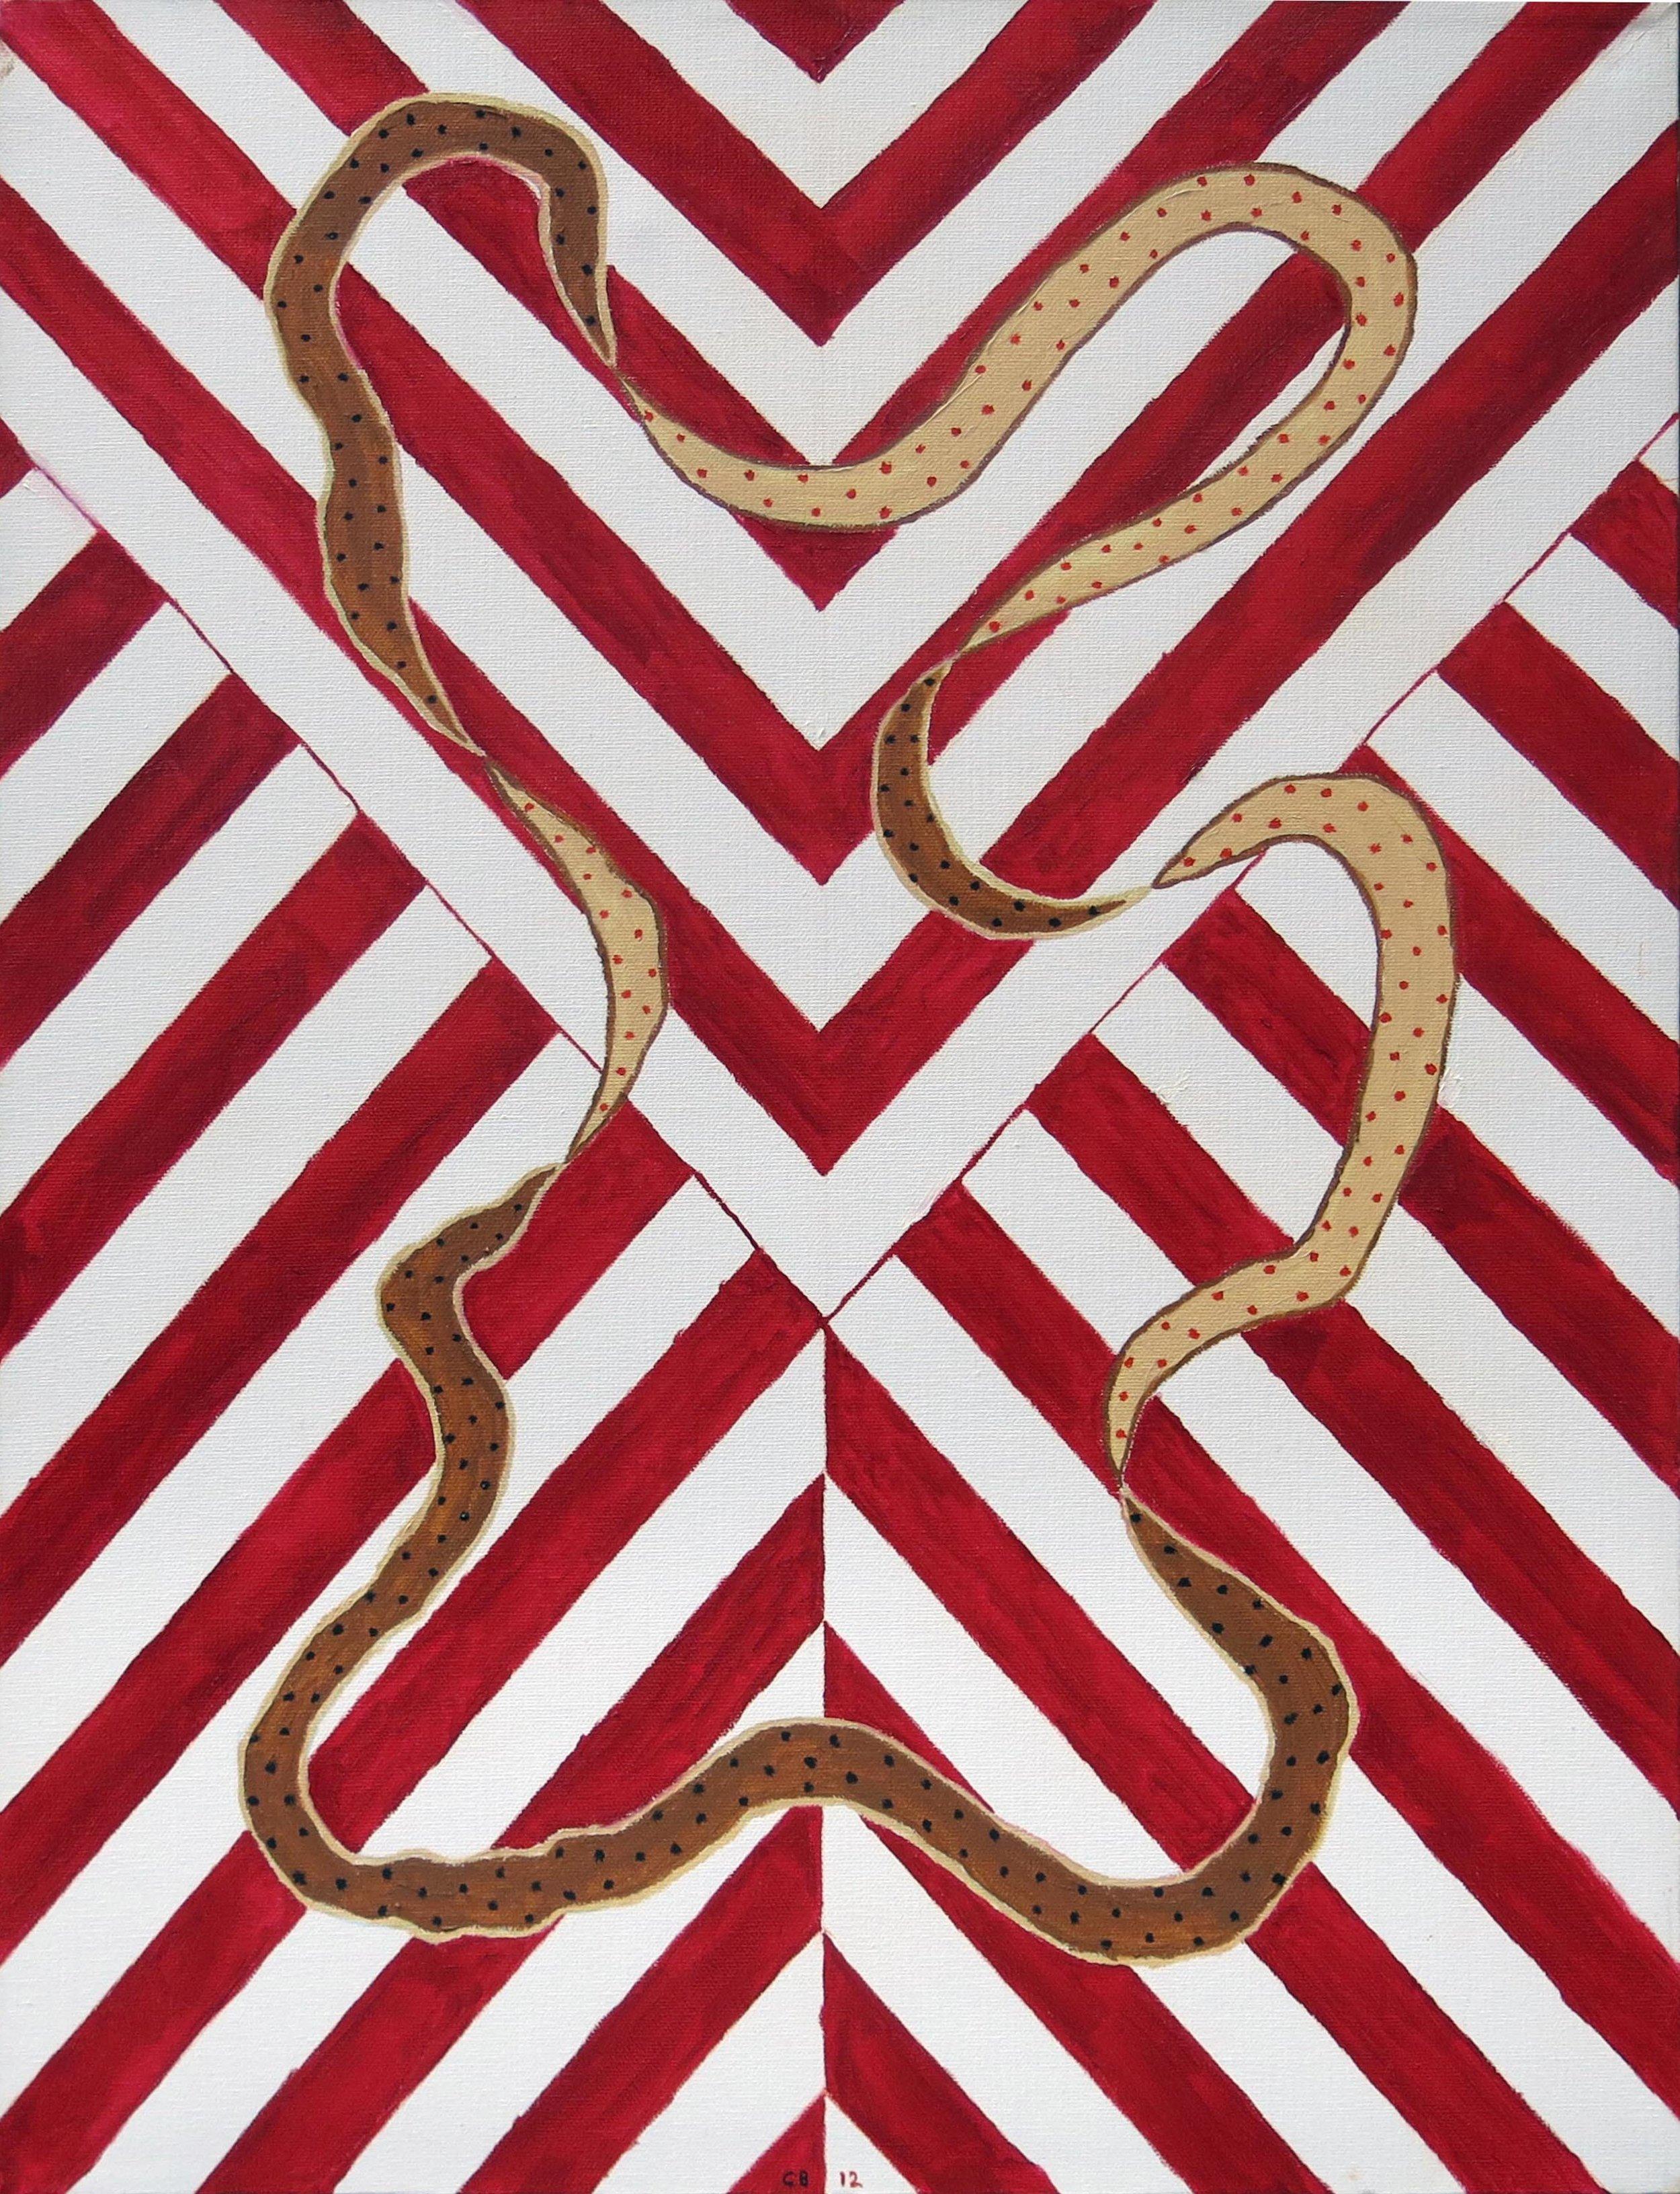 Chuck Boyce, Montsegur, 2012, oil on canvas, 24h x 18w in.